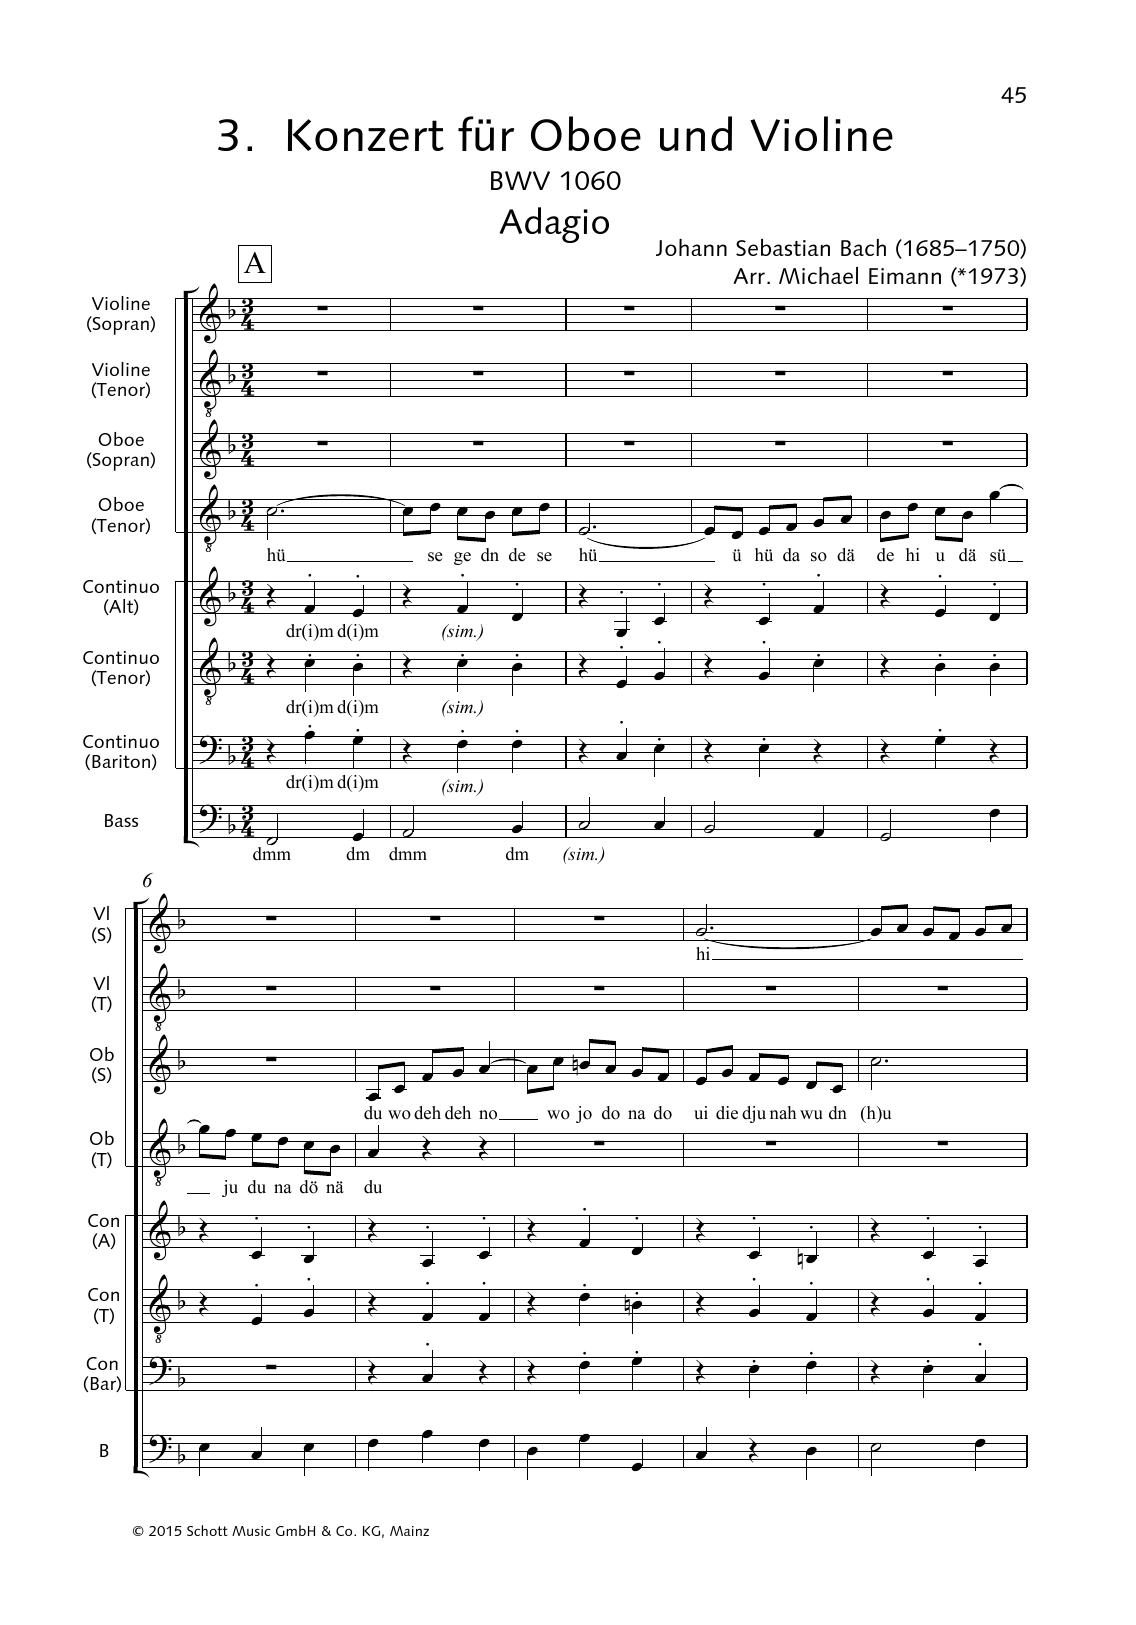 Concerto for Oboe and Violin (Adagio) Sheet Music